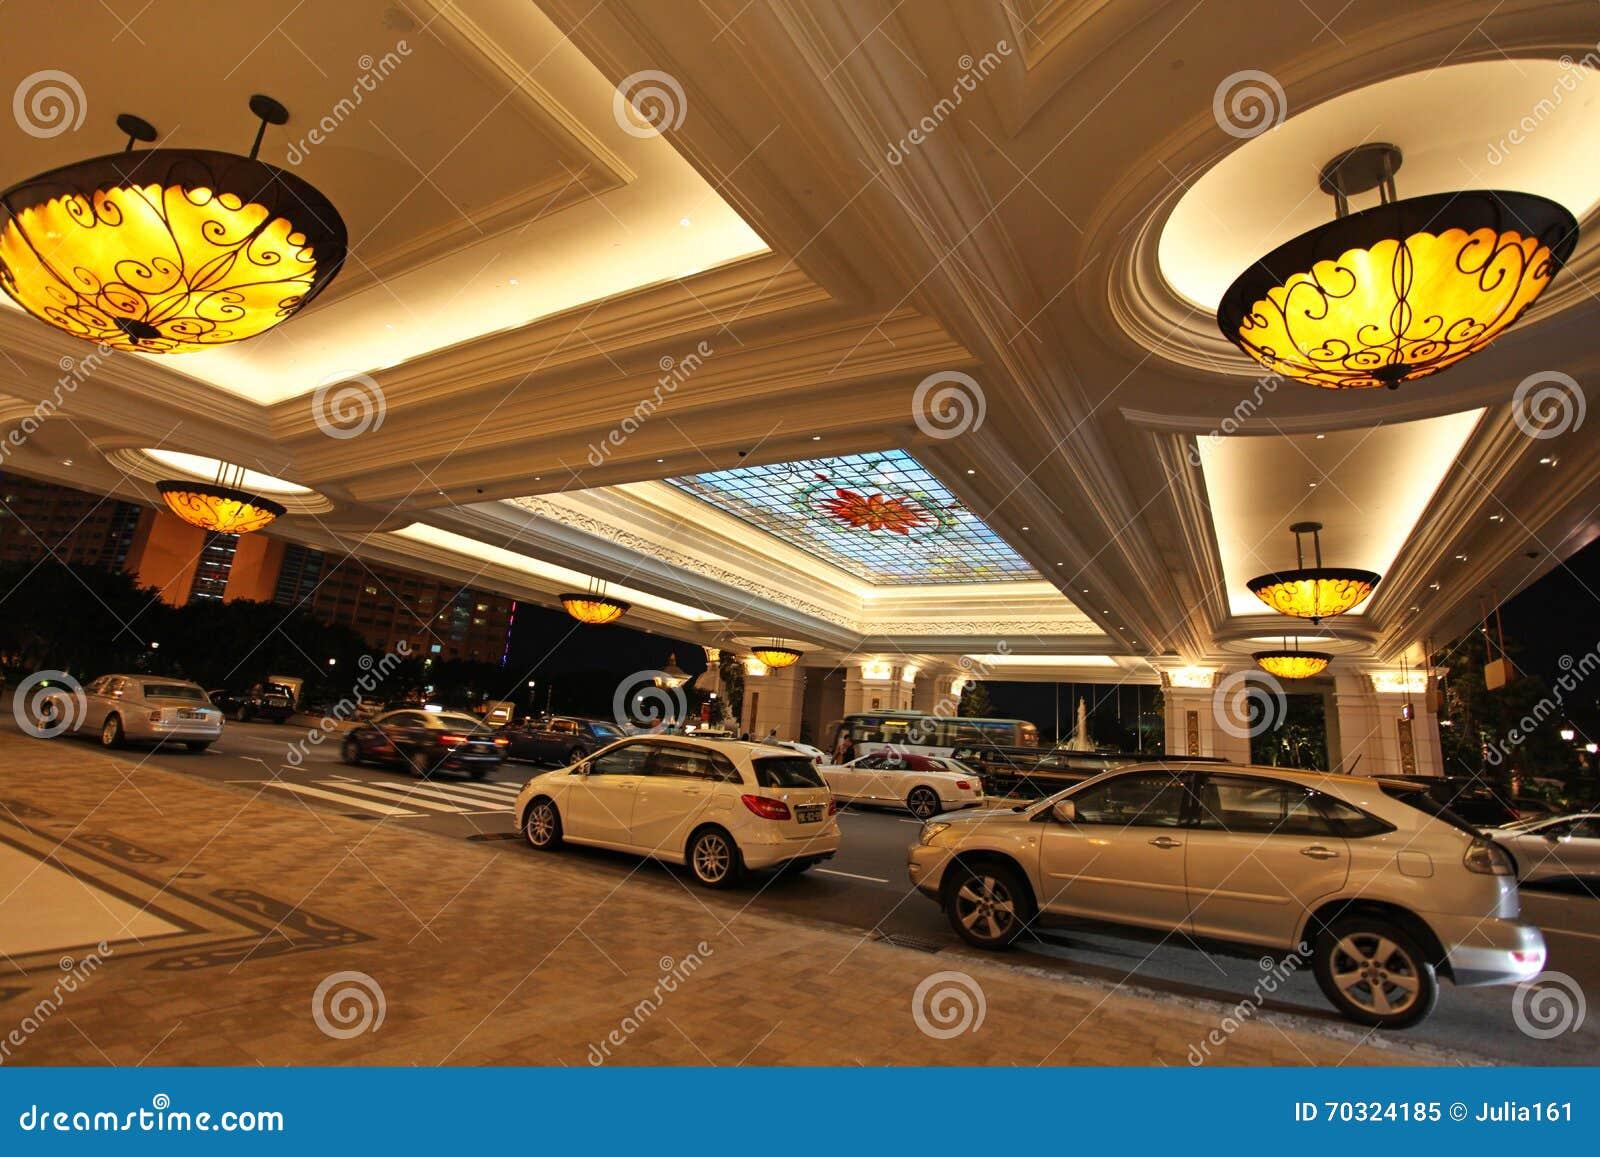 Casino car park ashanti emerald queen casino